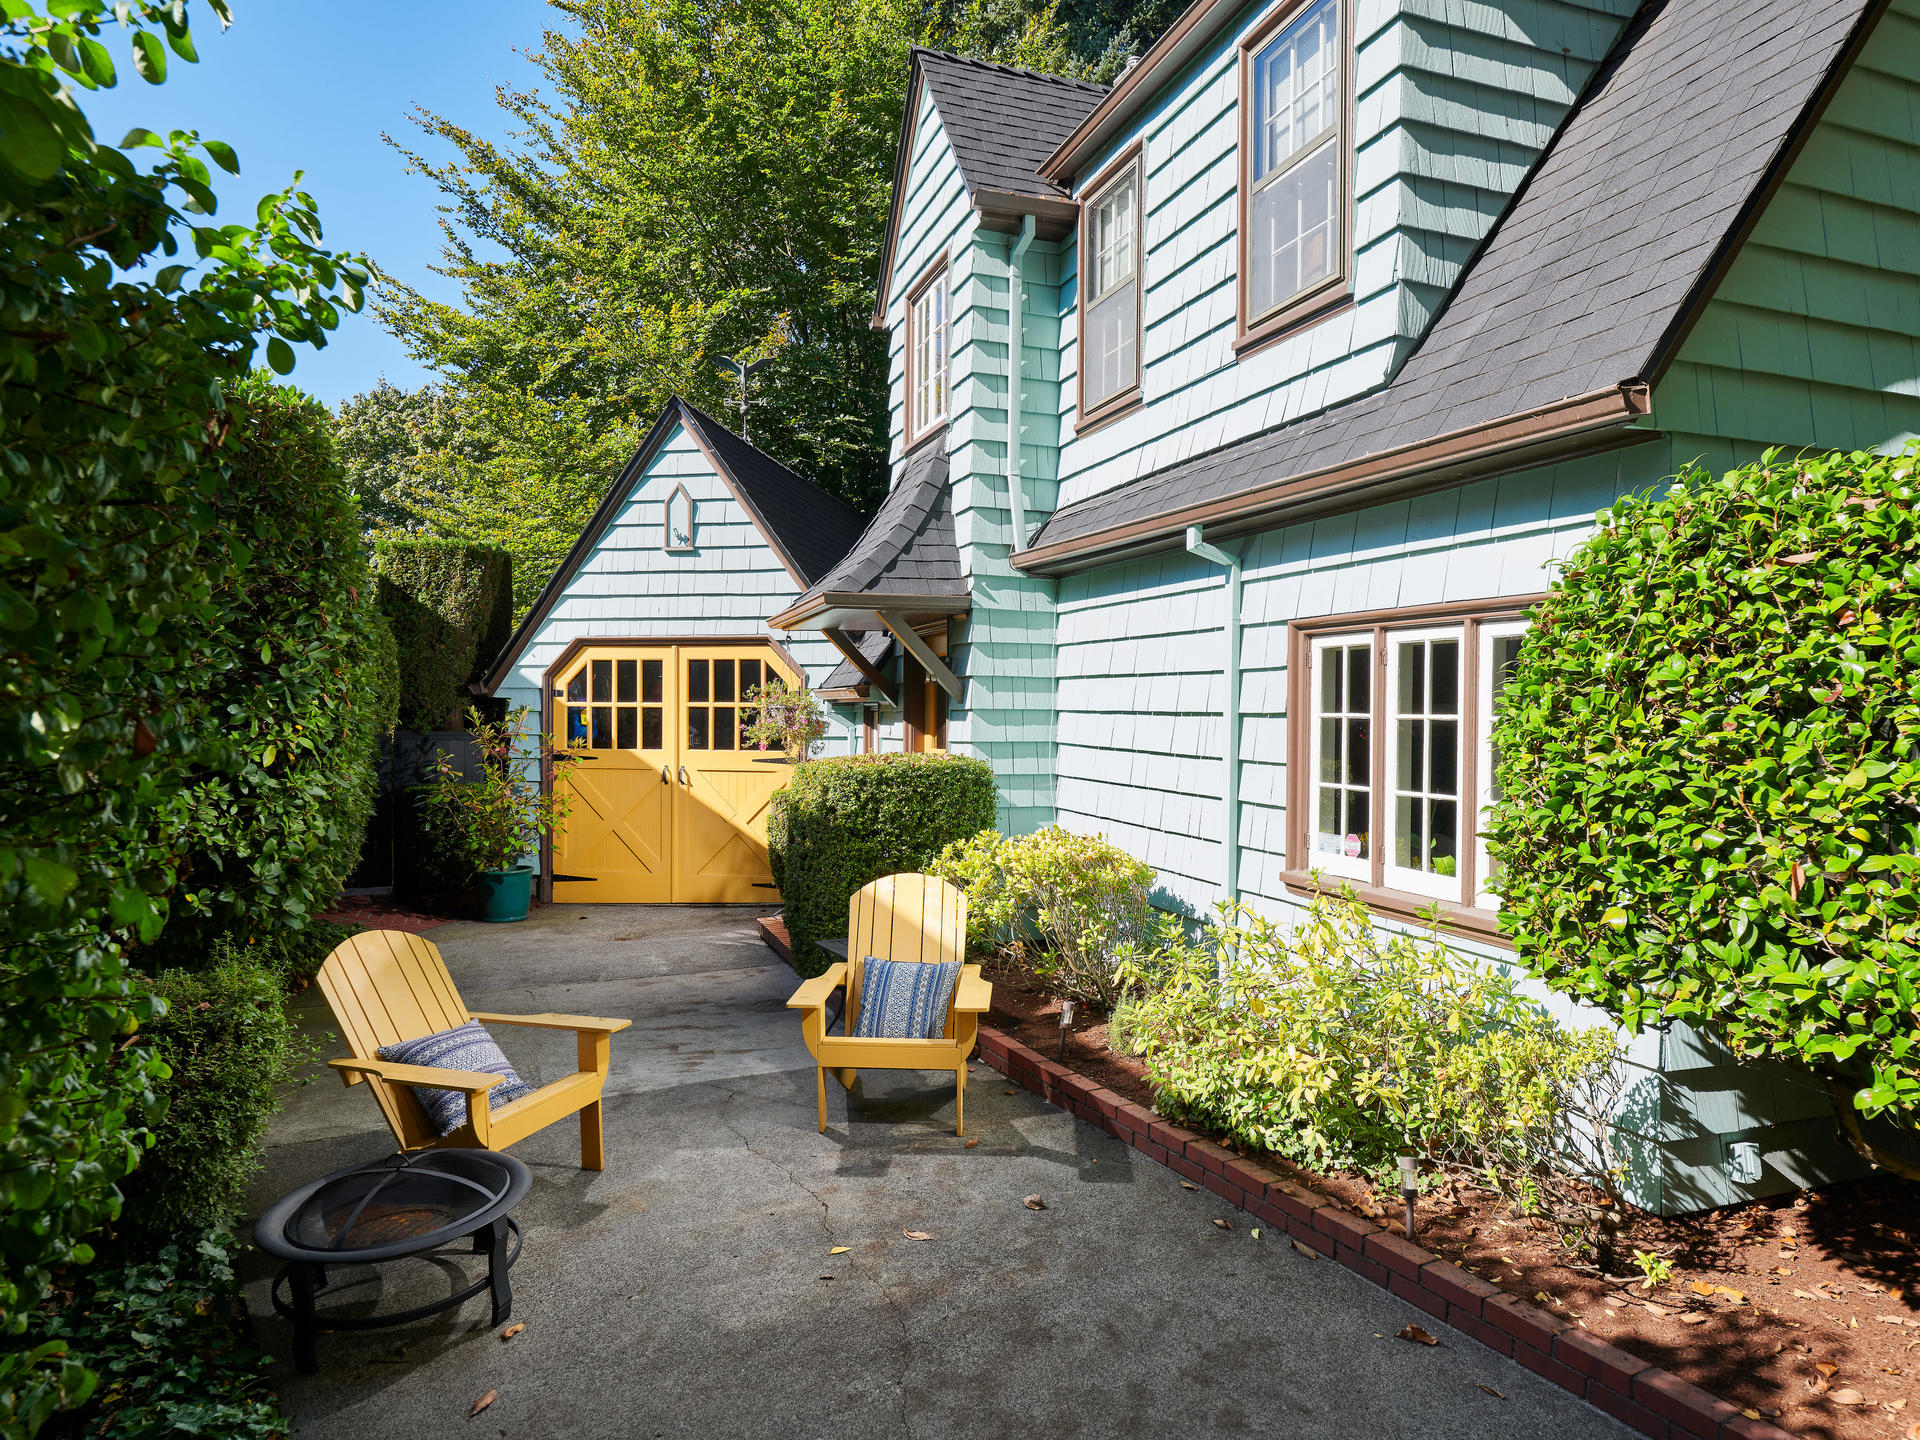 Driveway with Garage English Cottage in Portland Oregon